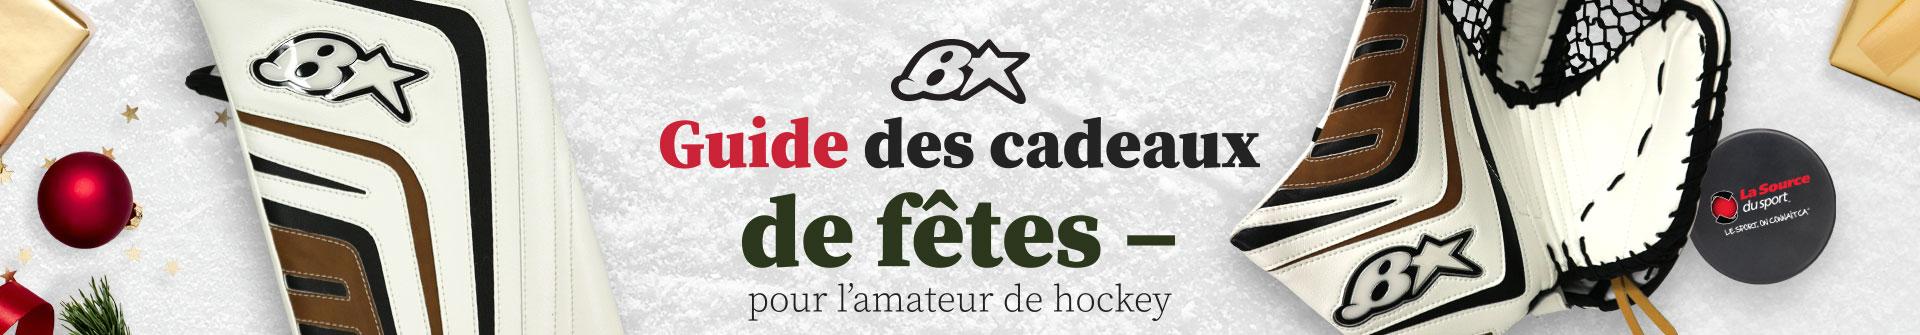 Shop Brians Custom Goalie Hockey Gift Ideas At Source For Sports Hockey Stores Near You.